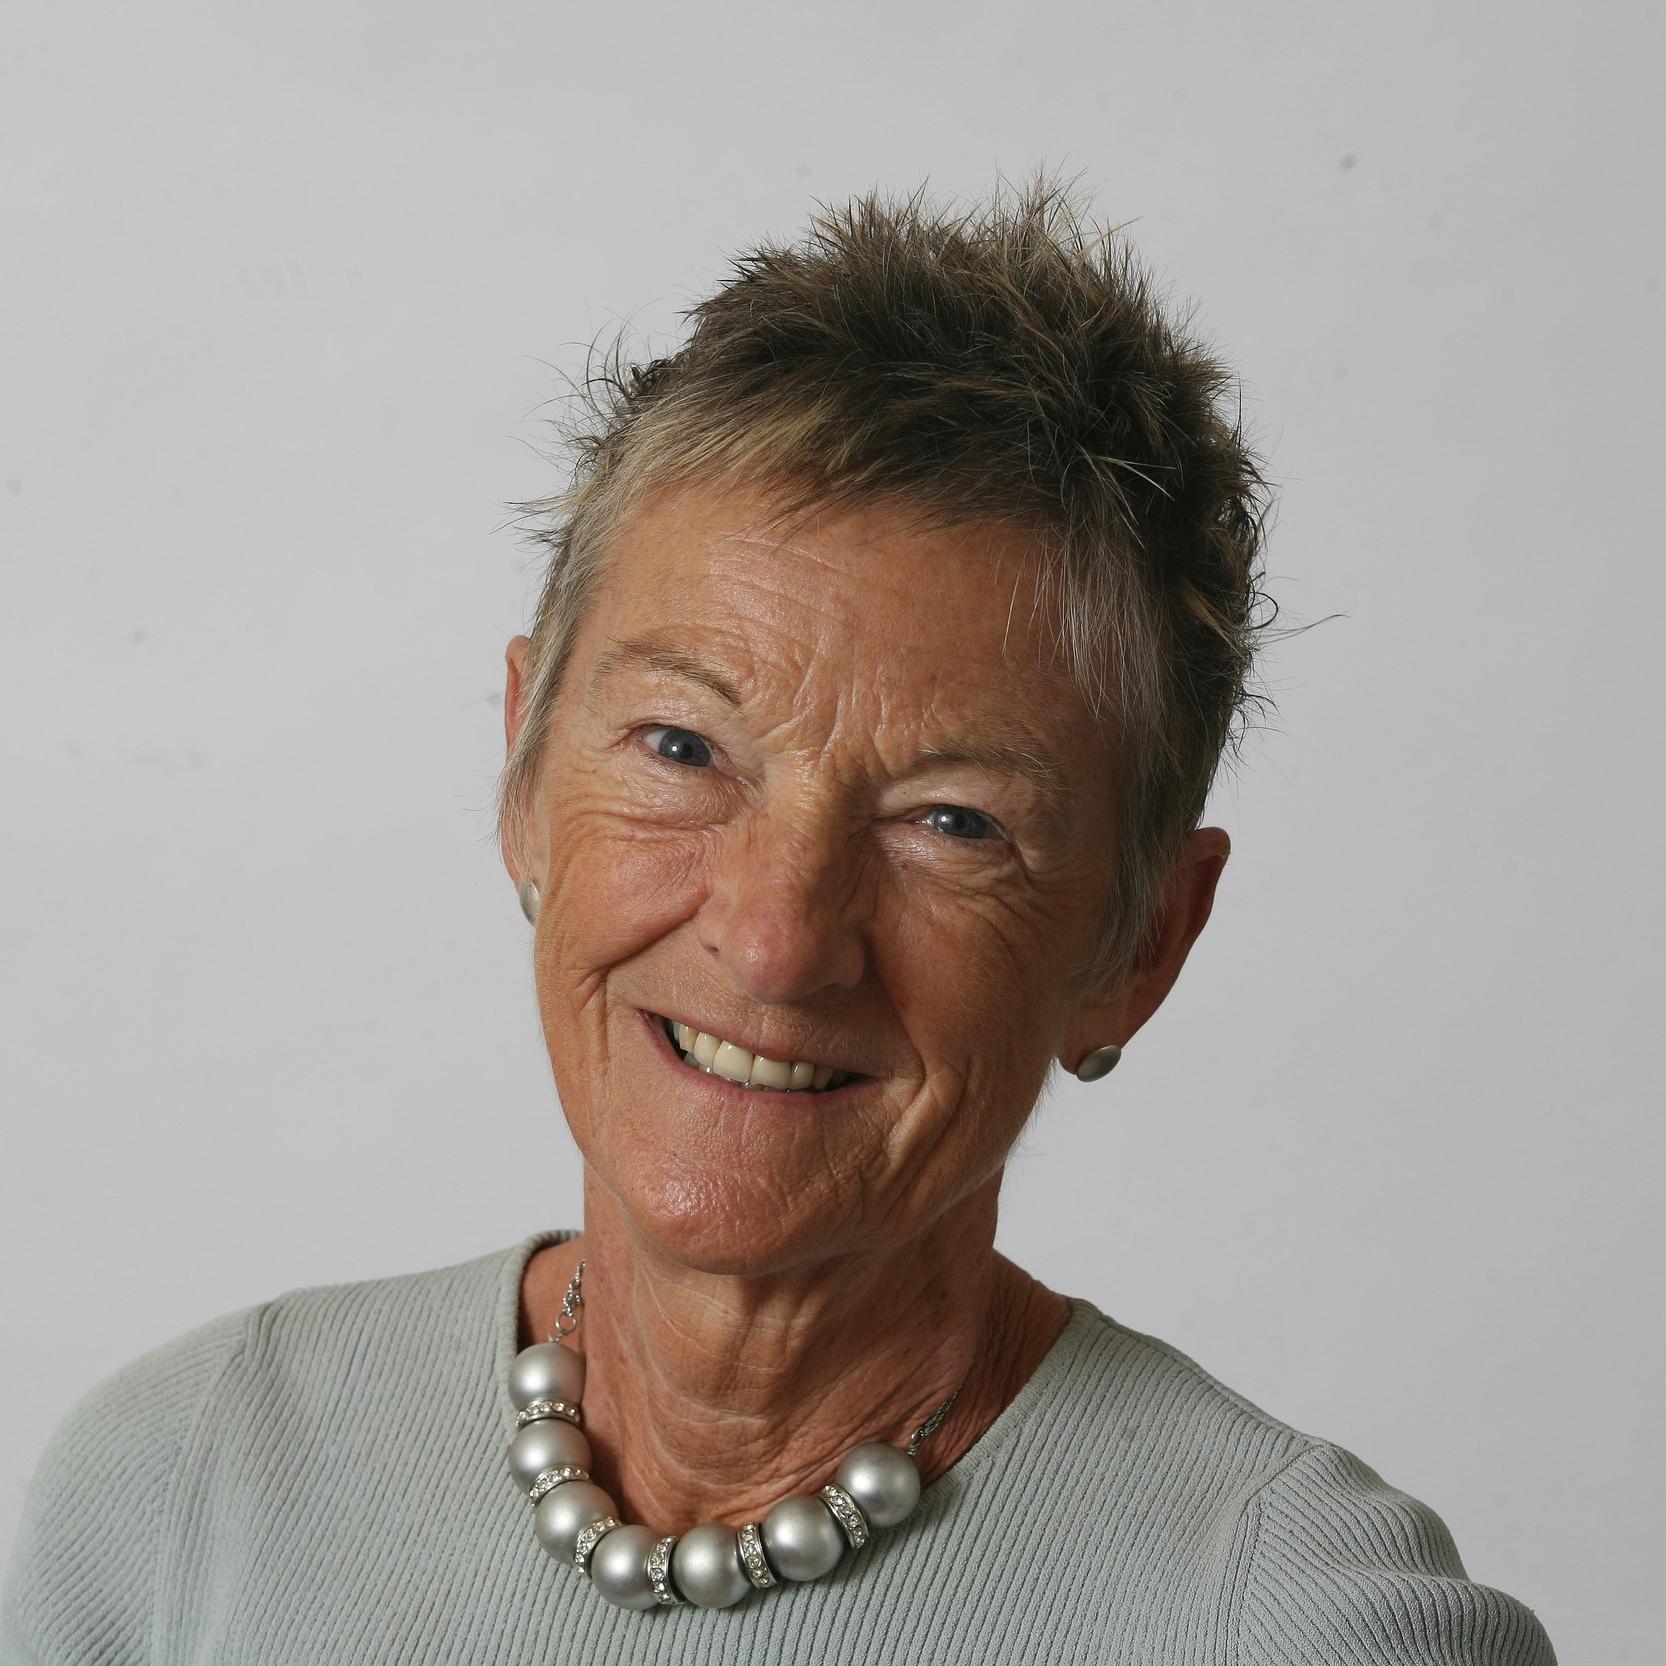 Dianne WillCOCKS - YORKSocial gerontology researcher